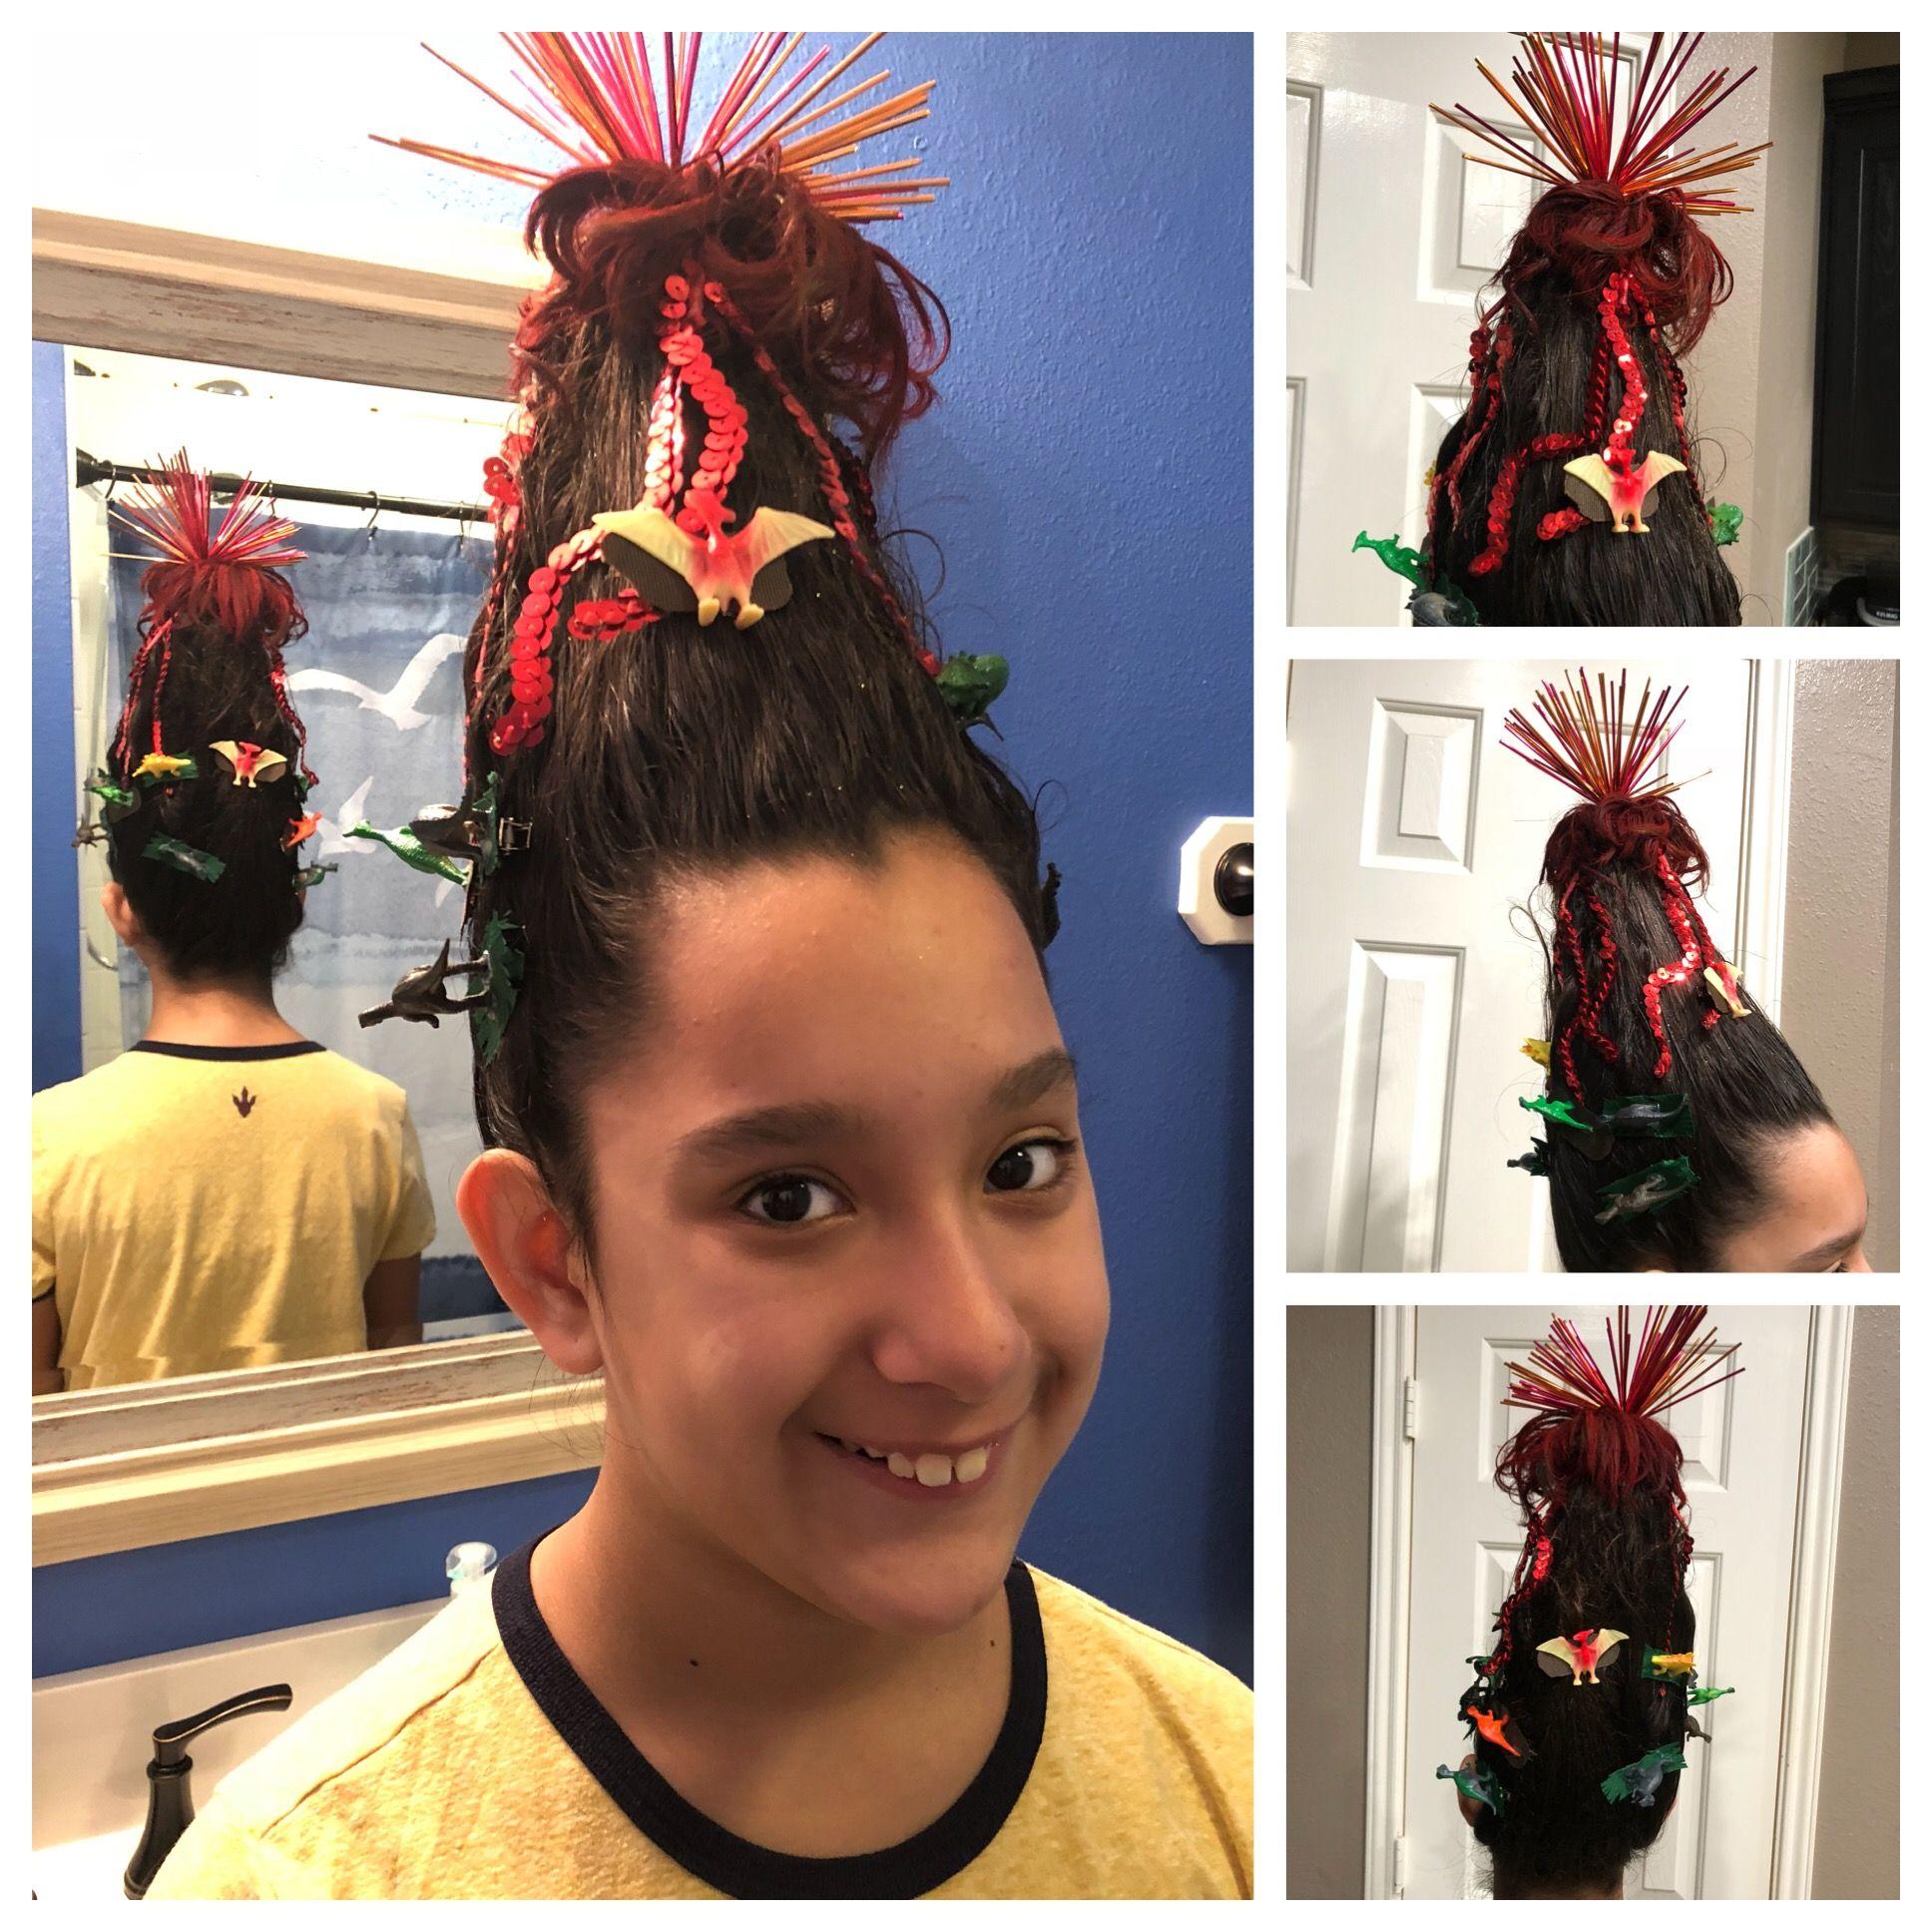 crazy hair day! volcano and dinosaurs (jurassic world